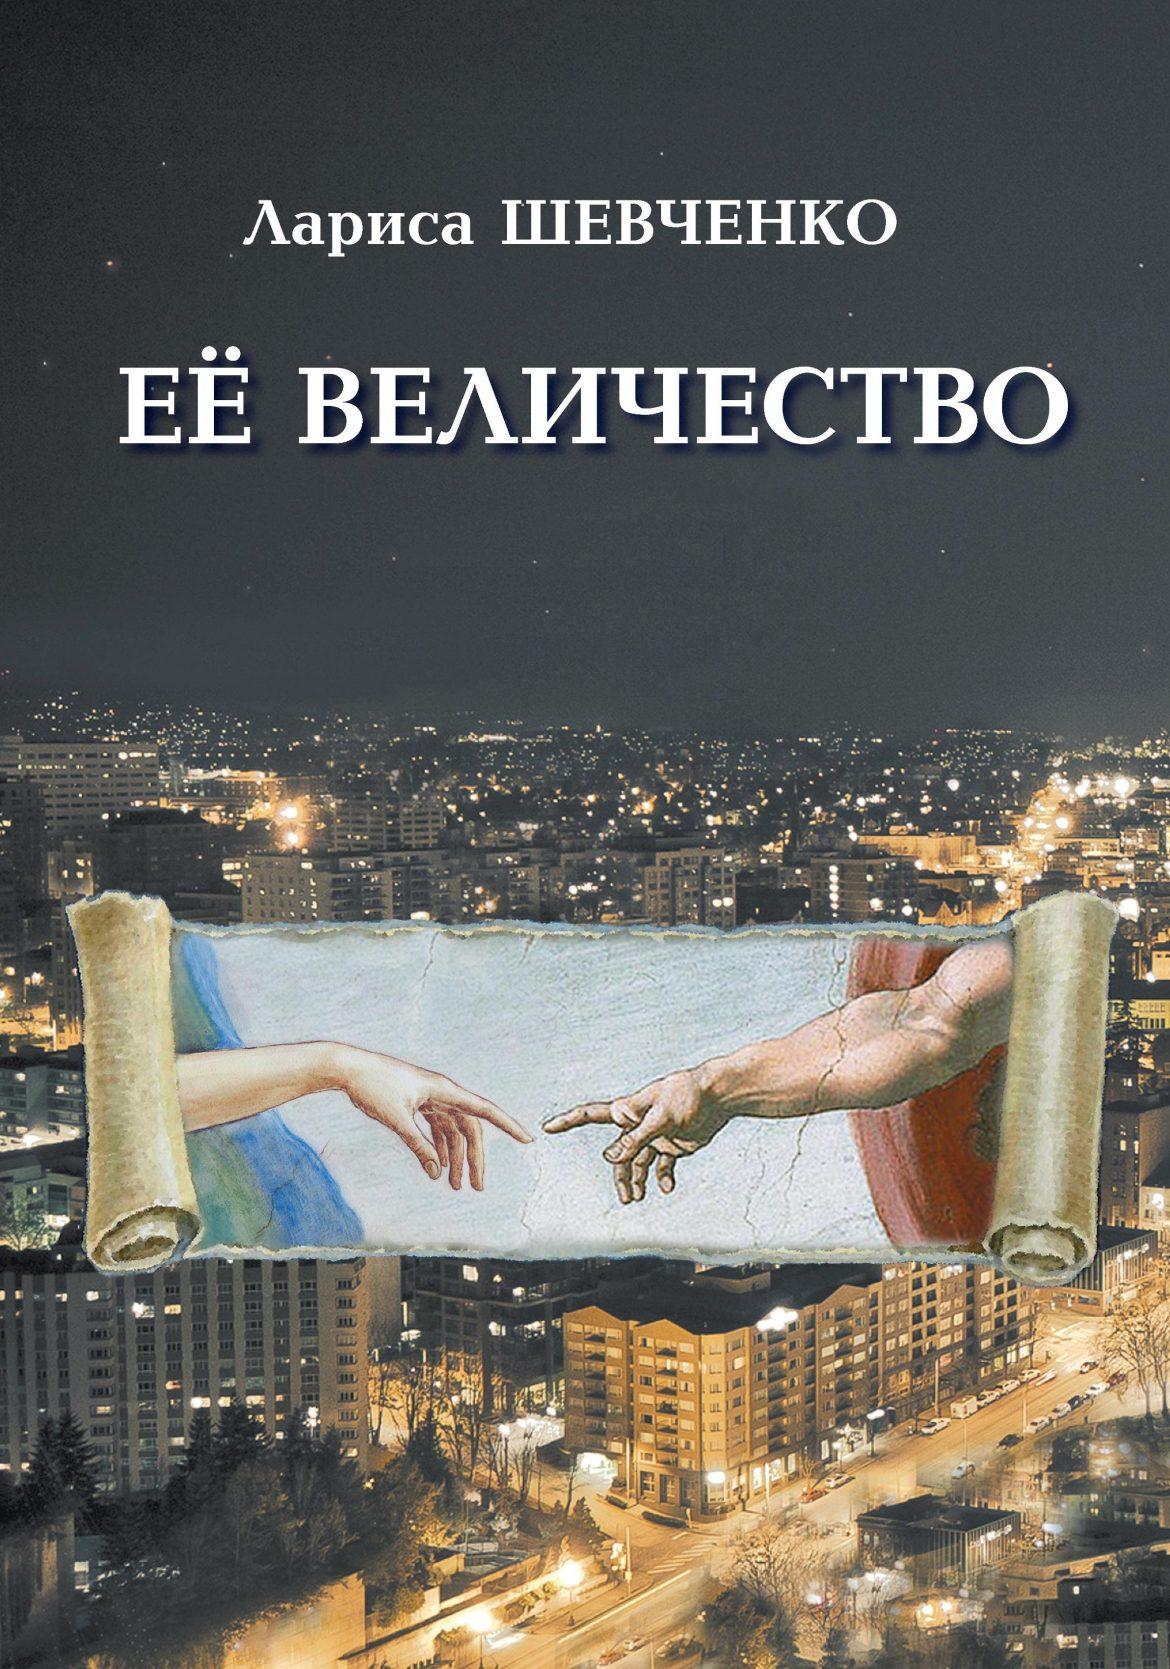 Её величество — Лариса Шевченко